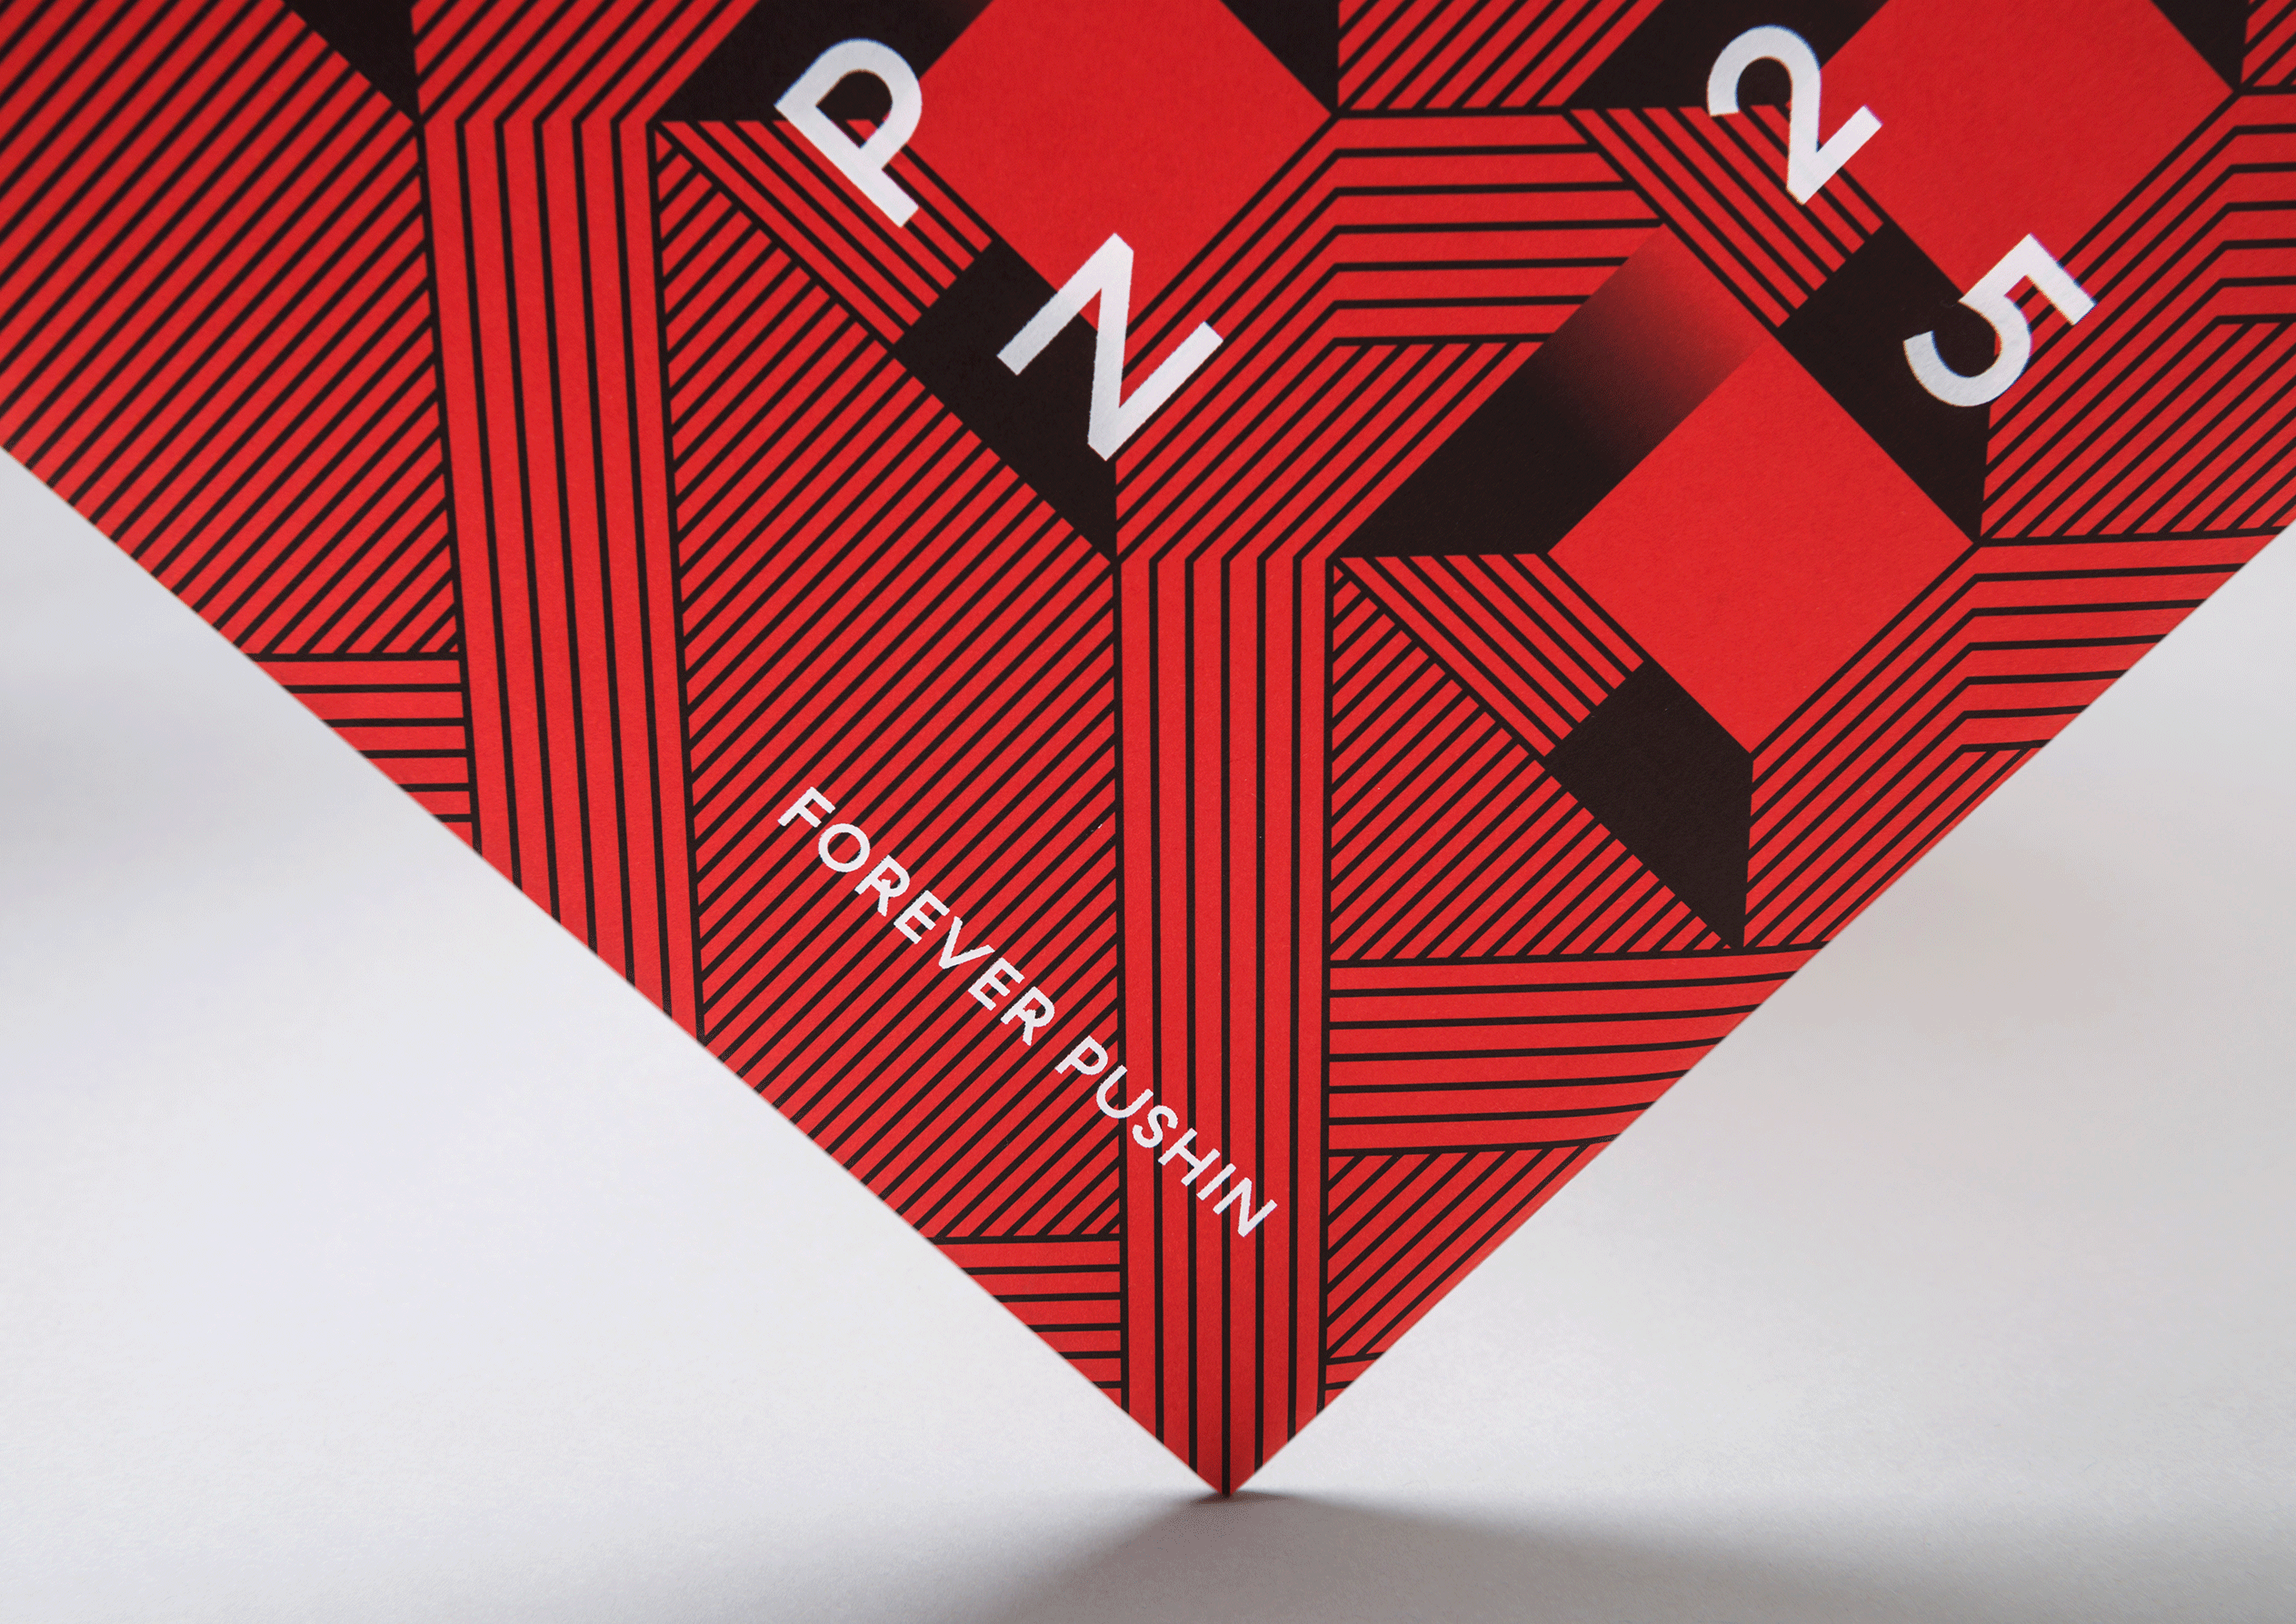 paperlux,schallplatte,cover,rot,boris-dlugosch,forever-pushin,retusche,farbanpassung,postproduktion